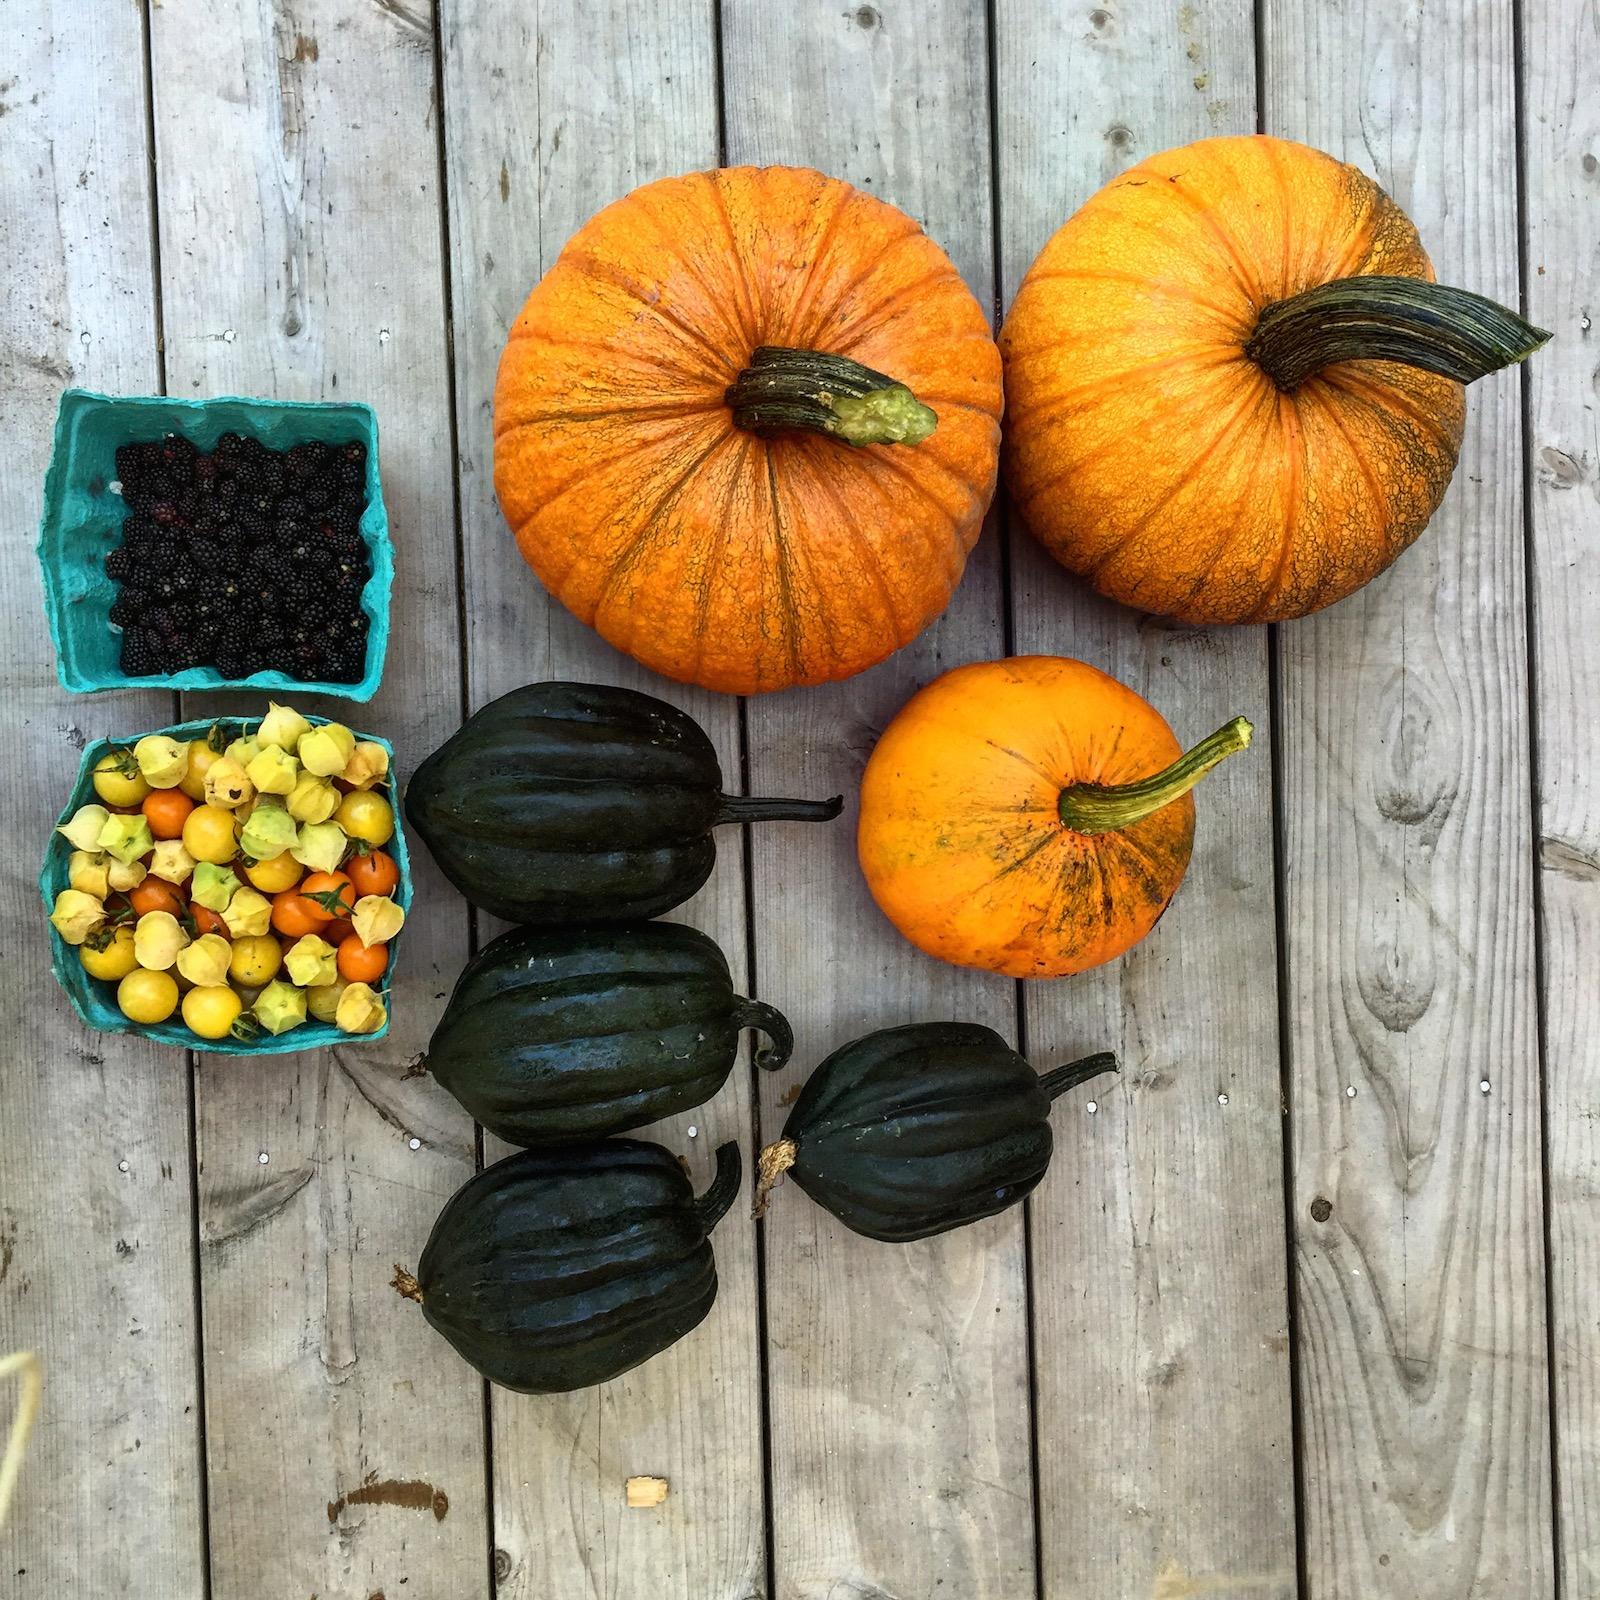 Pumpkins, Husk cherries, Squash, Tomatoes Maine